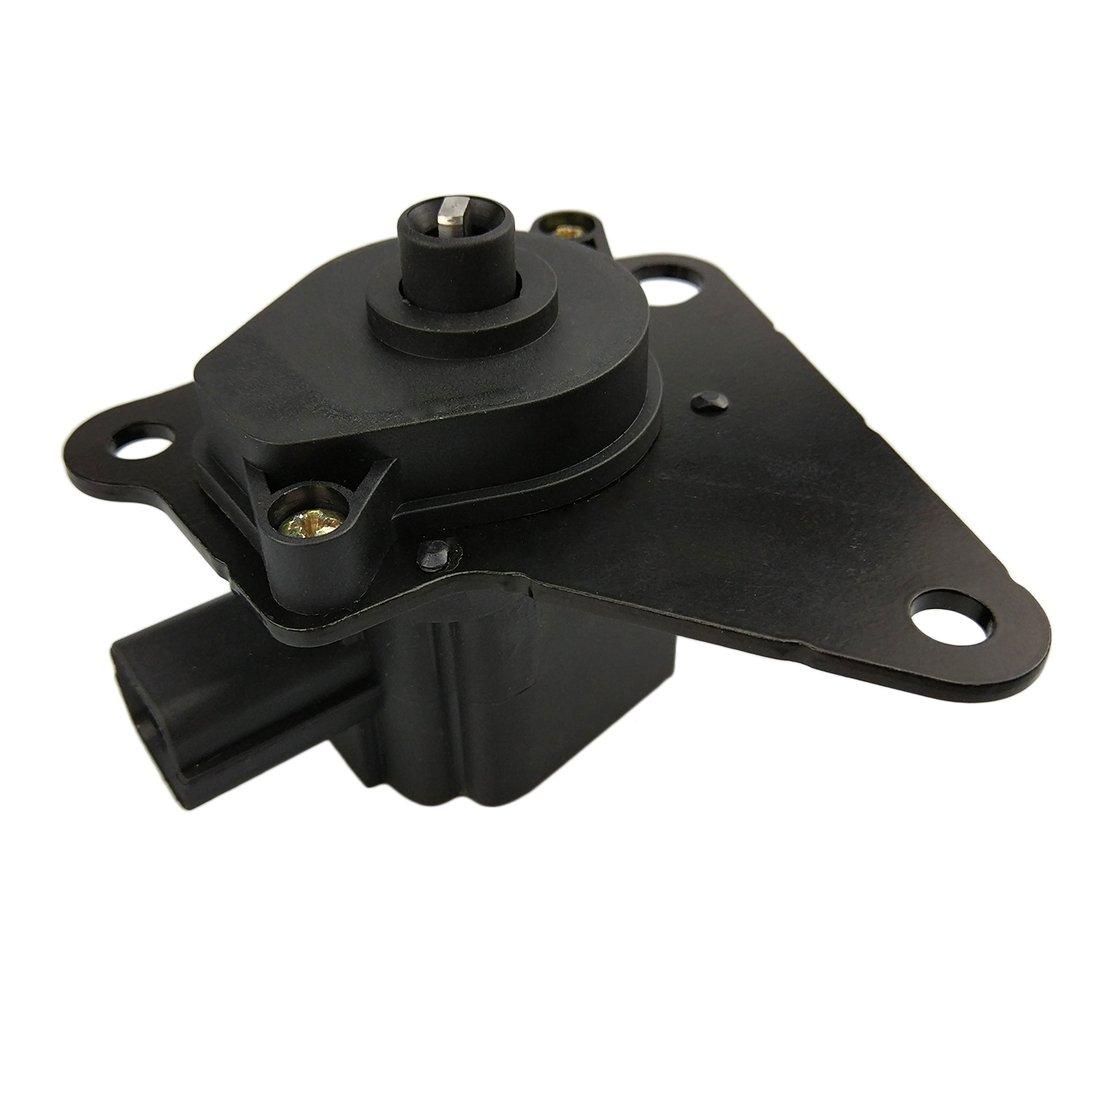 TuhooMall Intake Manifold Runner Control Valve for 1.8L 2.0L 2.4L Sebring Avenger Caliber Journey Compass Patriot